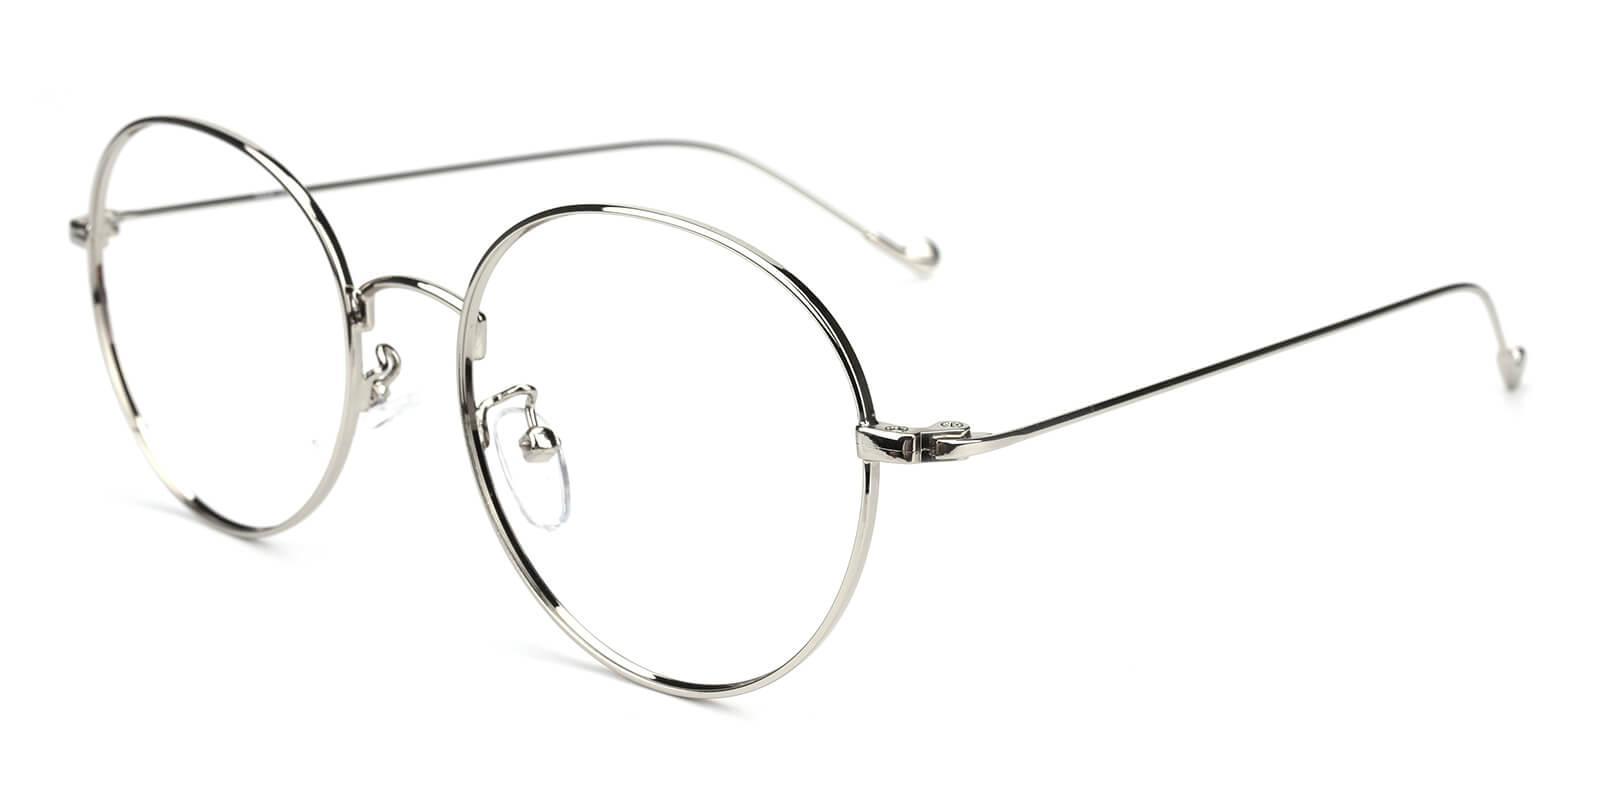 Jessy-Silver-Round-Metal-Eyeglasses-additional1